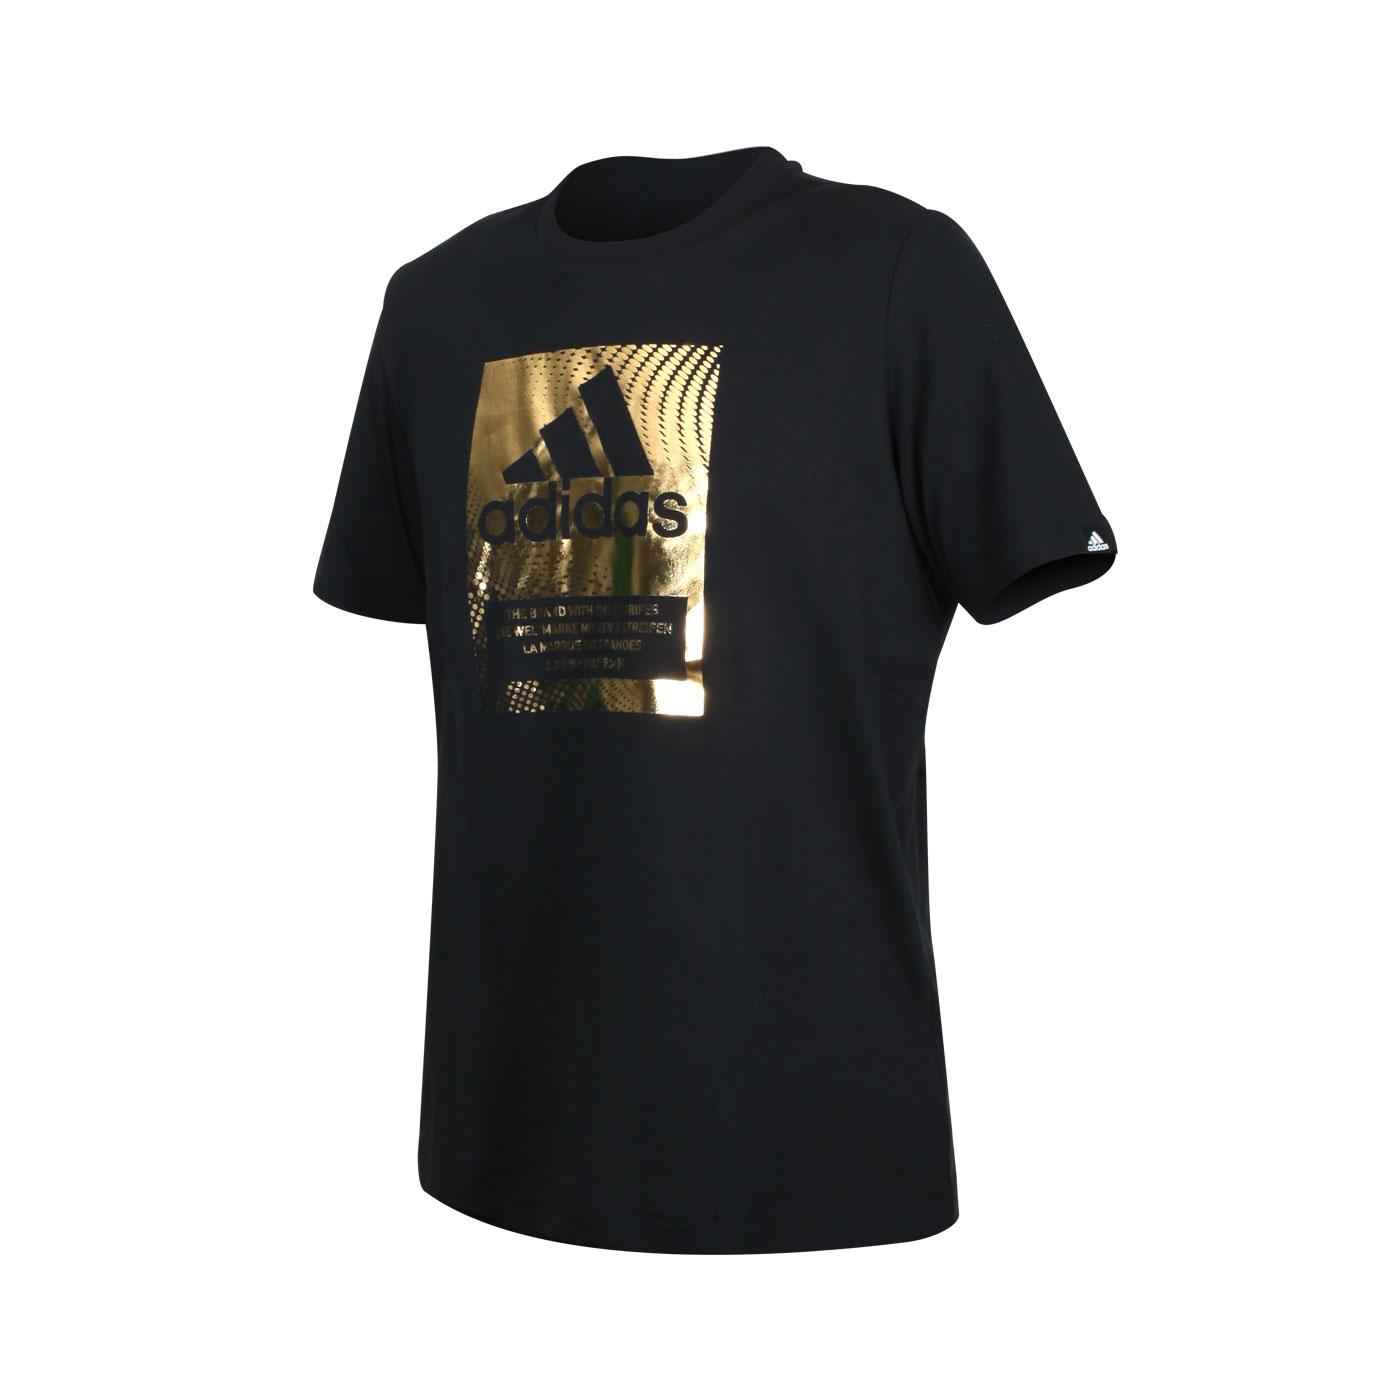 ADIDAS 男款短袖T恤 GS6316 - 黑金